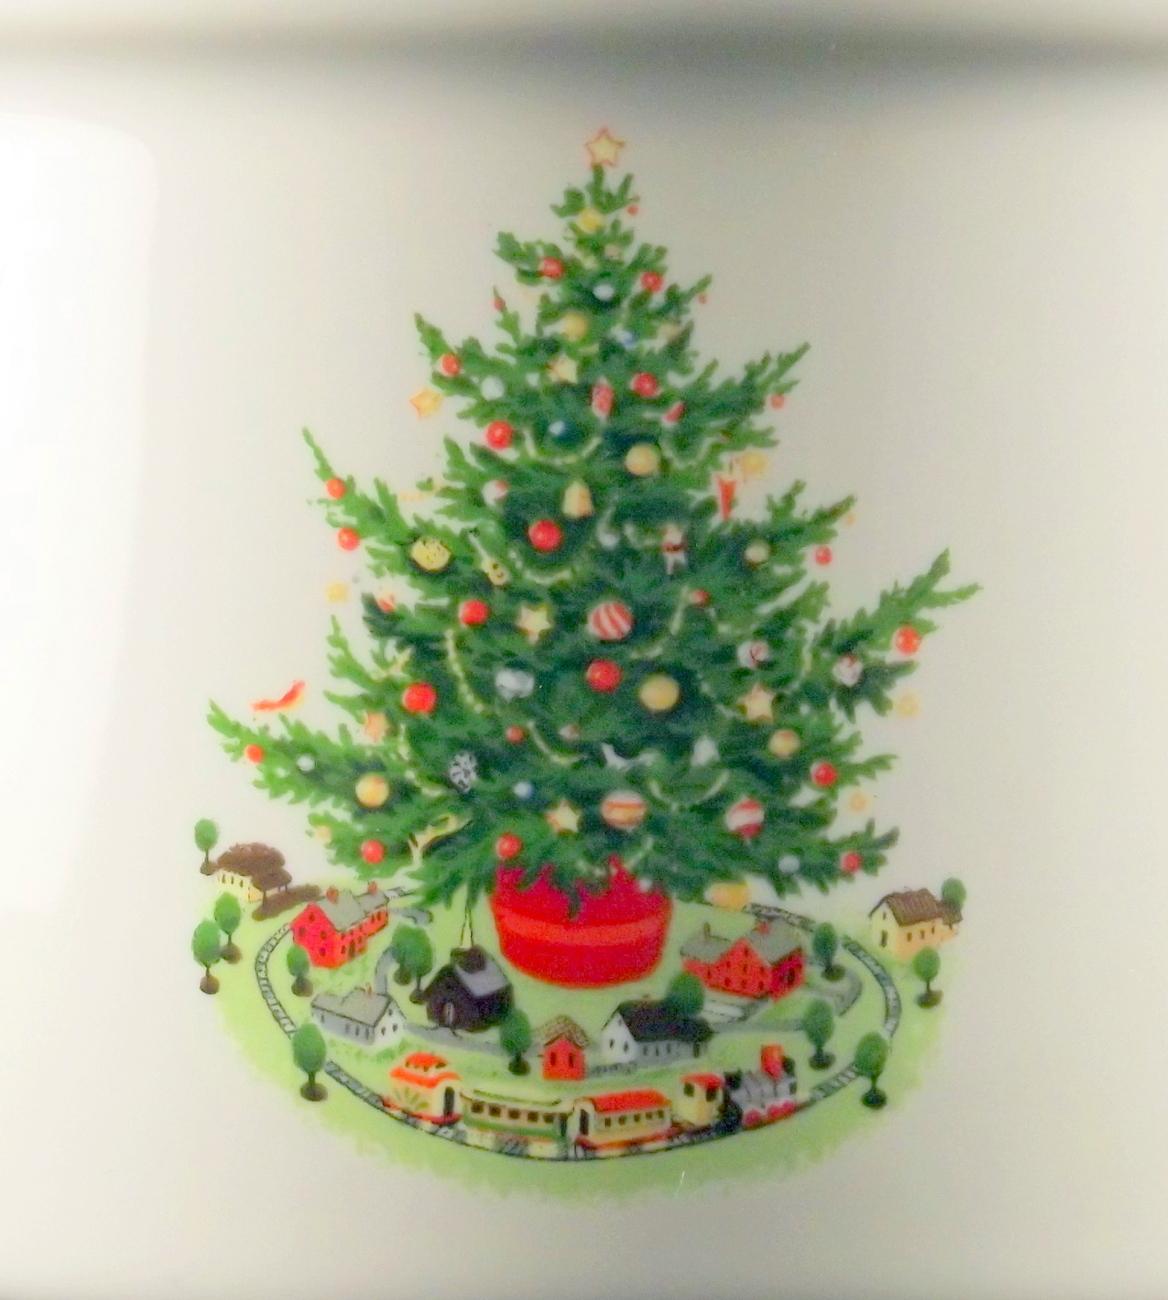 Pfaltzgraff Christmas Heritage pillar candle holder holiday tree design